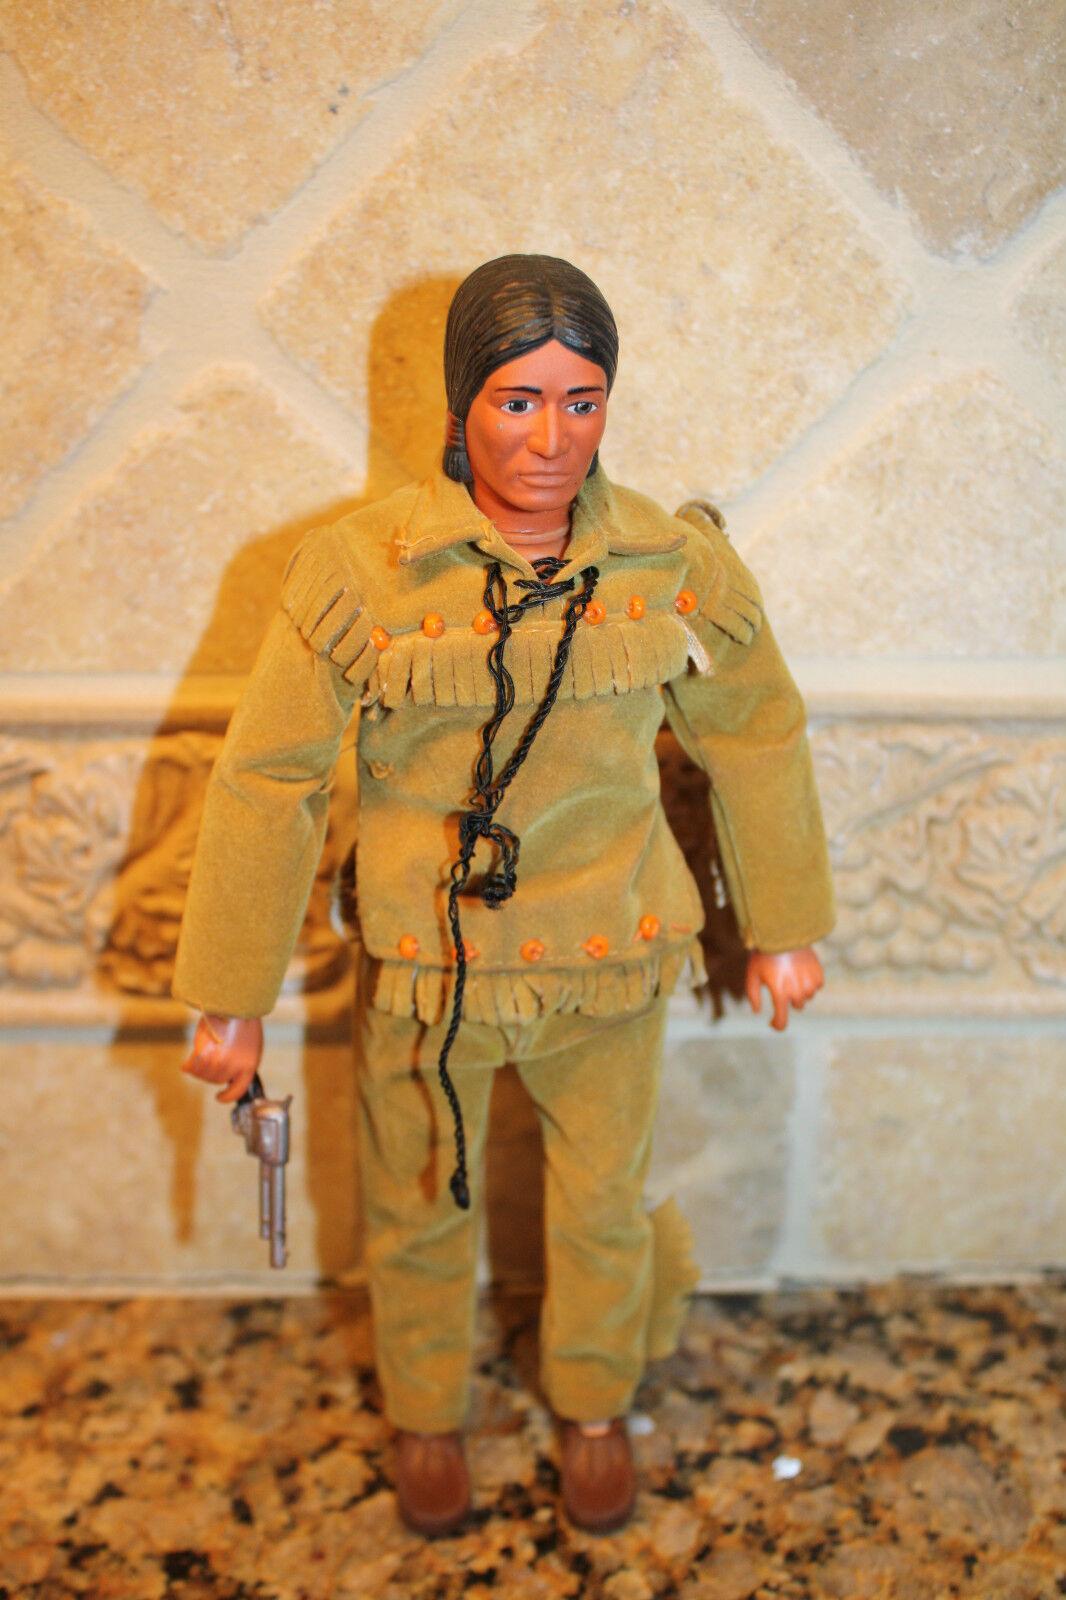 1973 Vintage Gabriel Tonto 10  Figure The Lone Ranger Rides Again